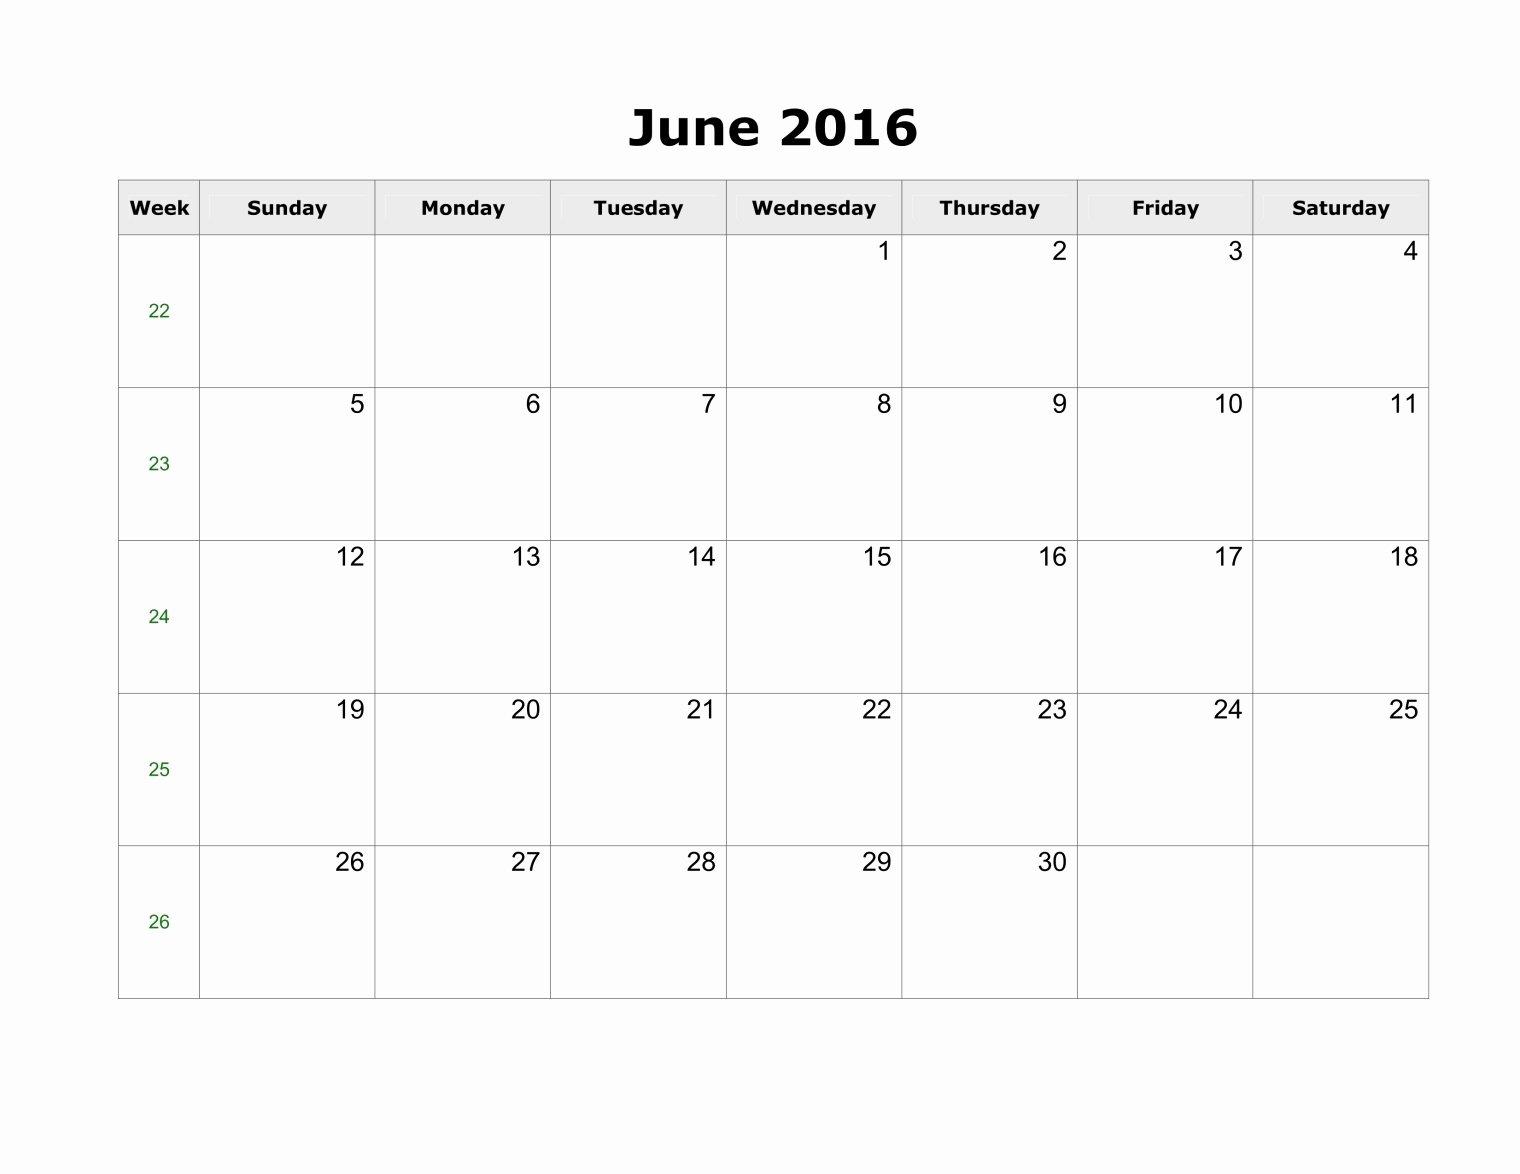 Blank Calendar Template 2016 Awesome June 2016 Printable Calendar Landscape A4 Portrait